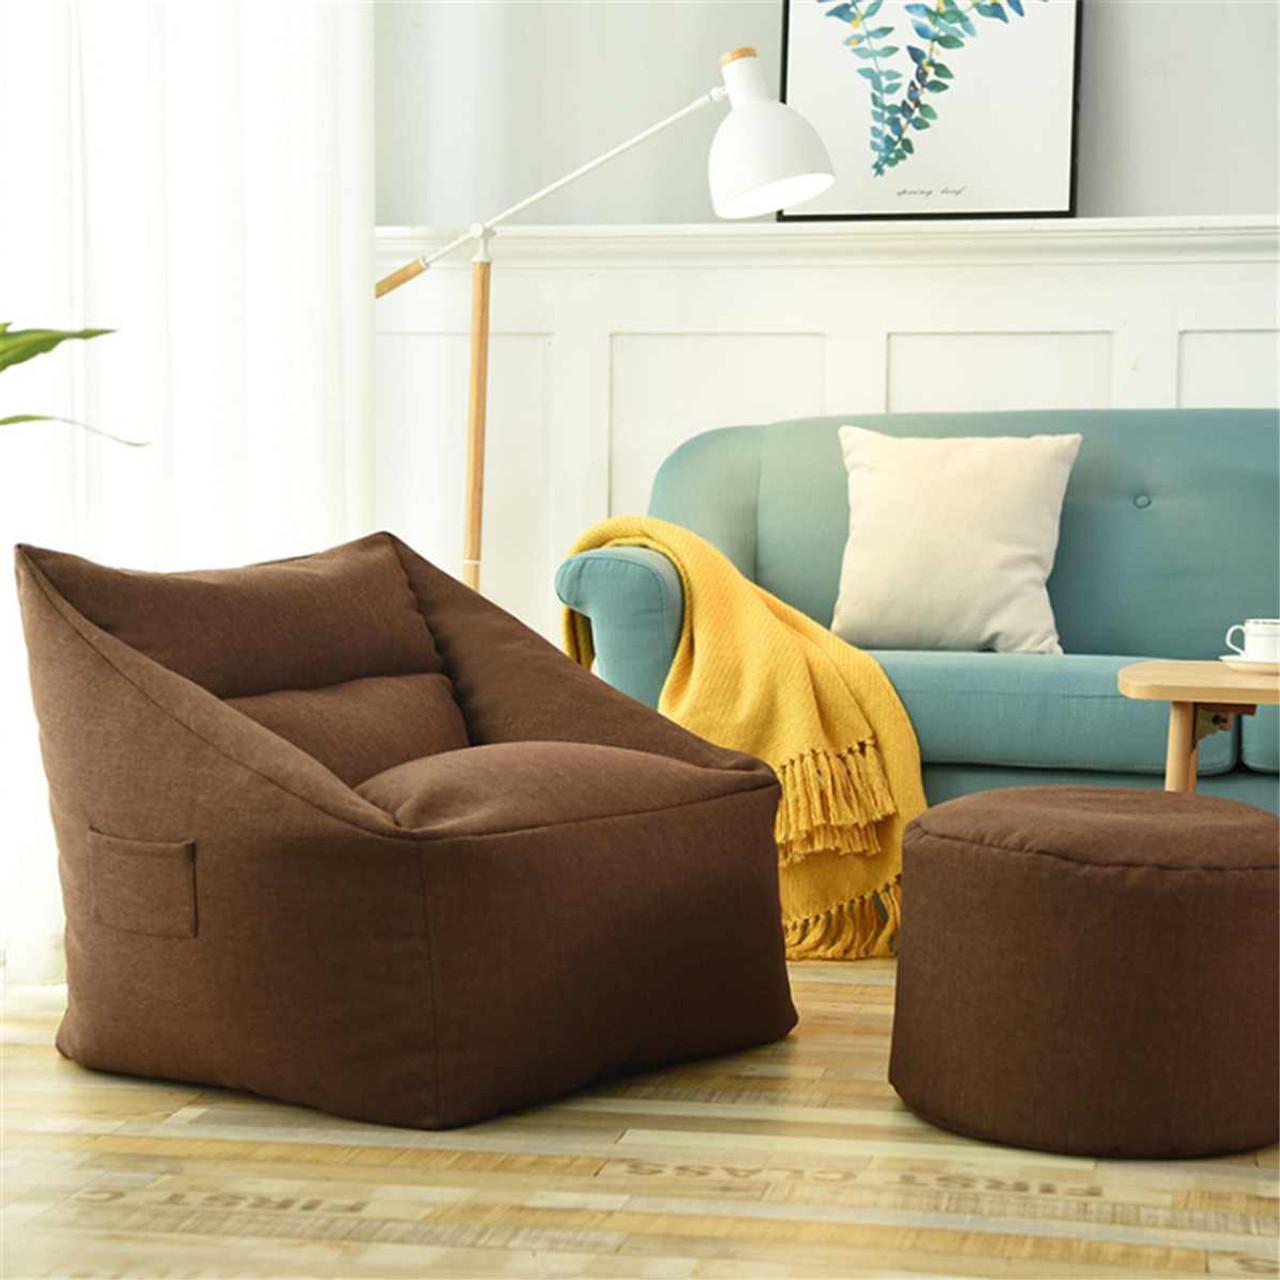 Washable Beanbag Sofas Waterproof Bean Bag Lazy Sofa Indoor Seat